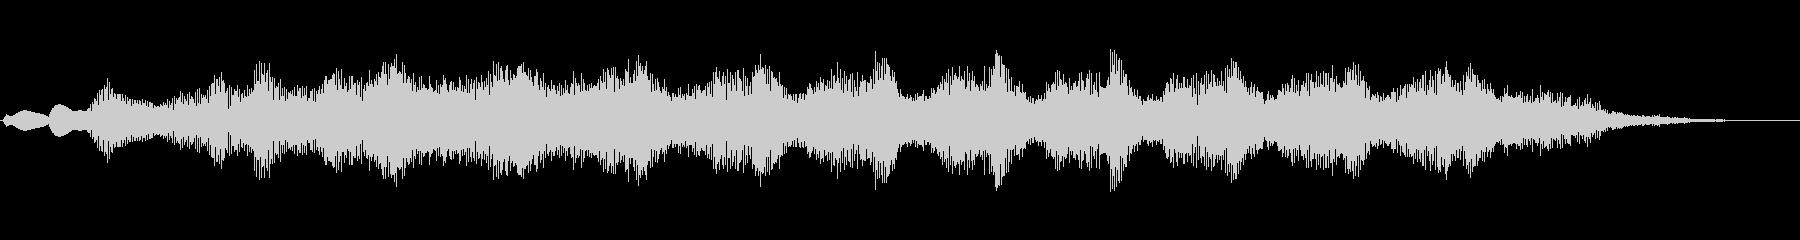 KANT考えてる時の音効果音08313の未再生の波形